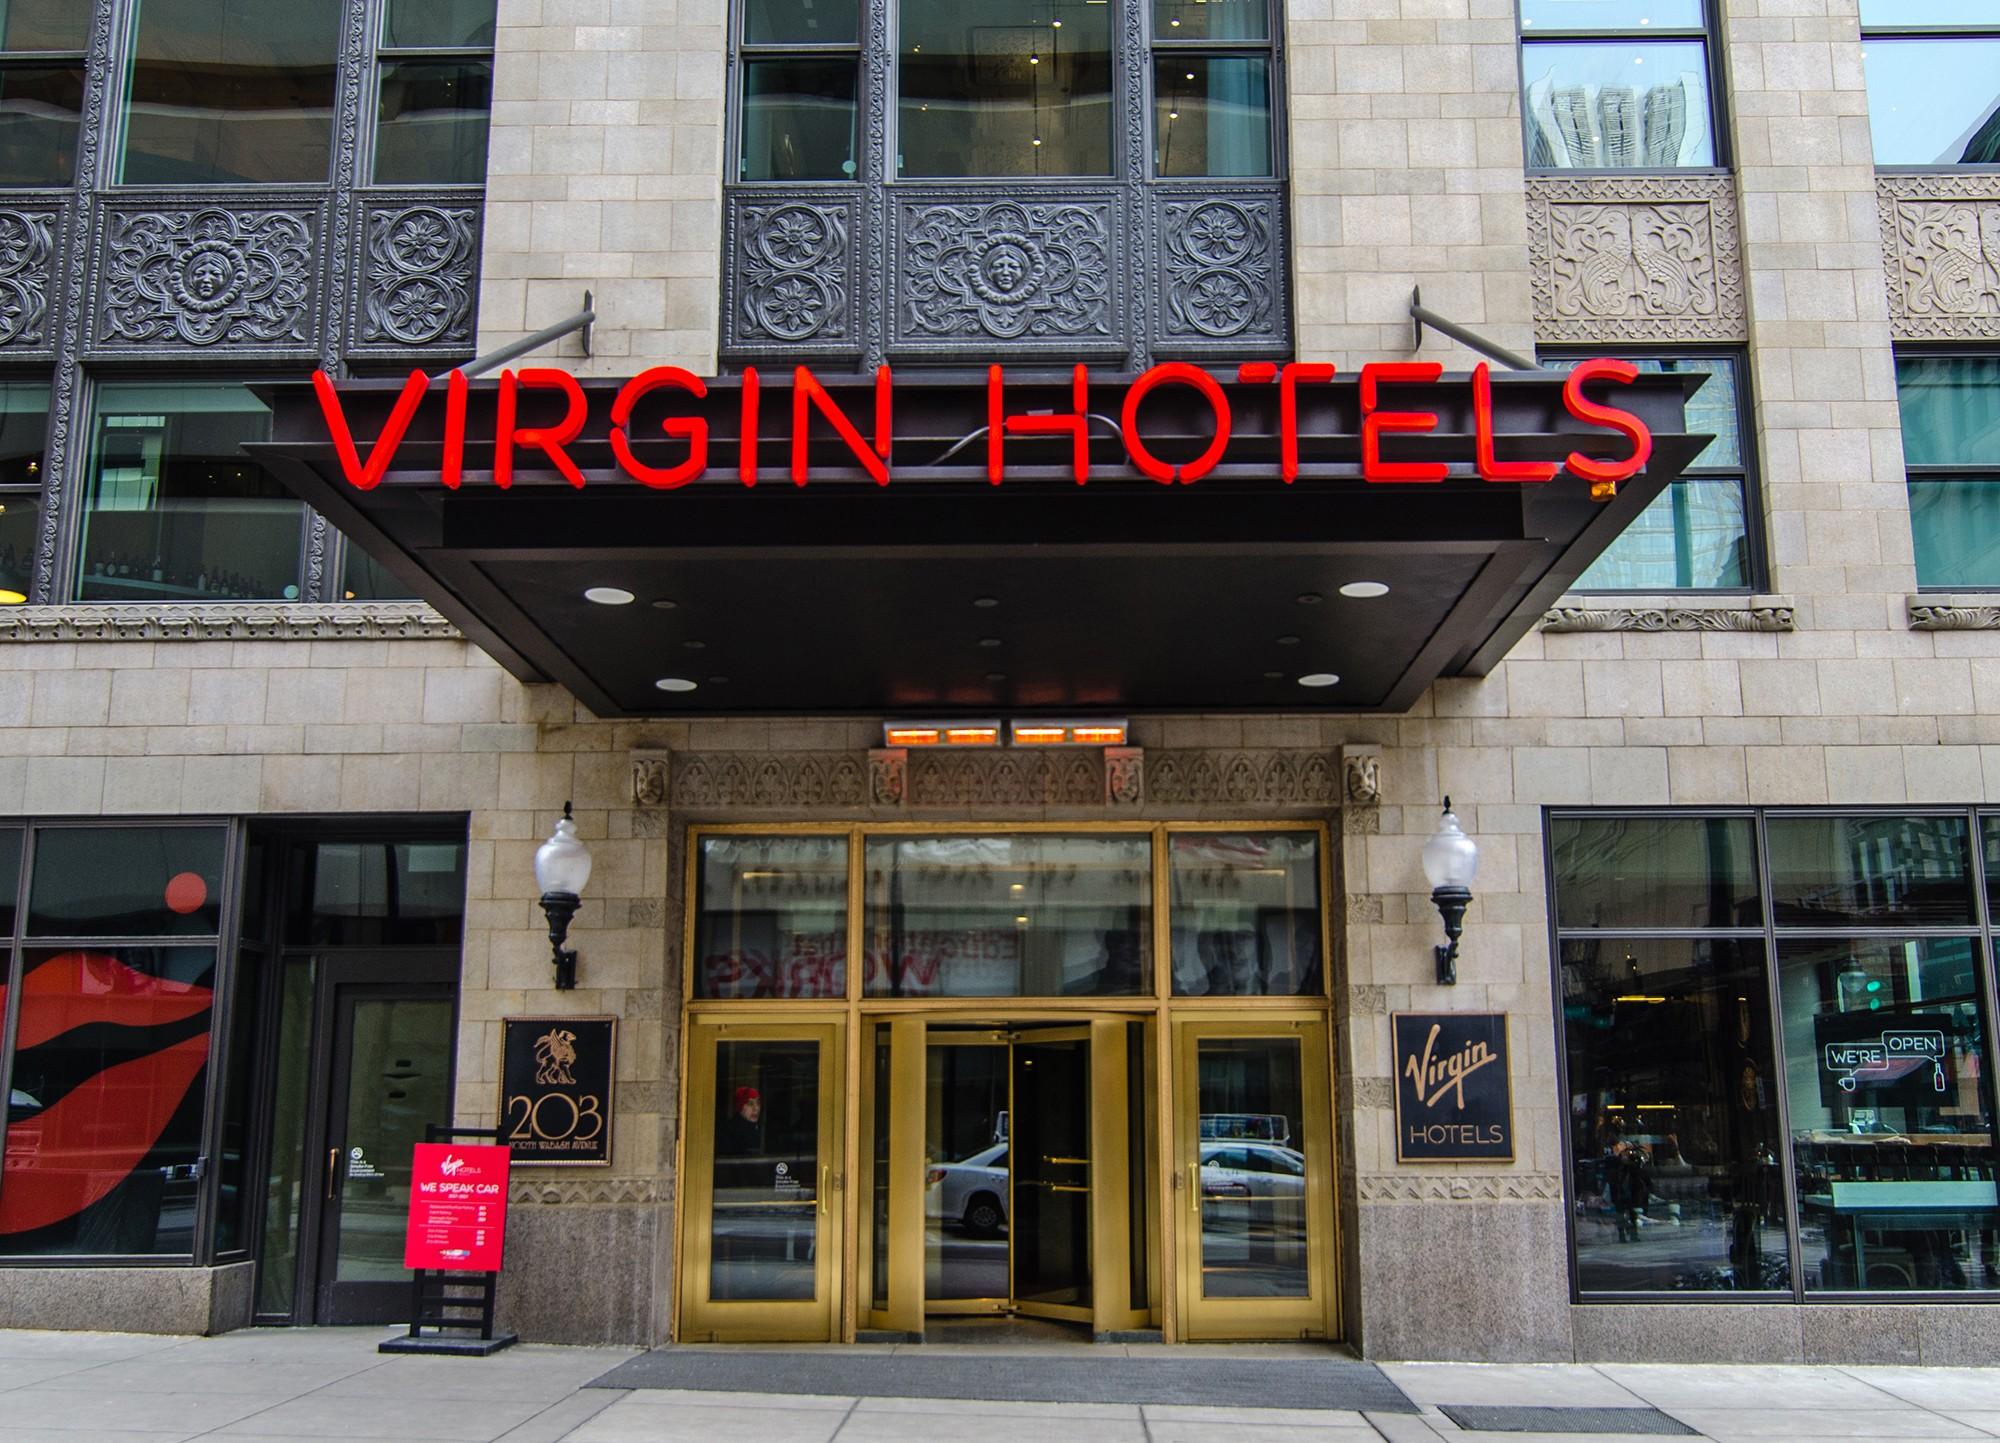 Virgin Hotels Chicago 203 N Wabash Il Motels Mapquest